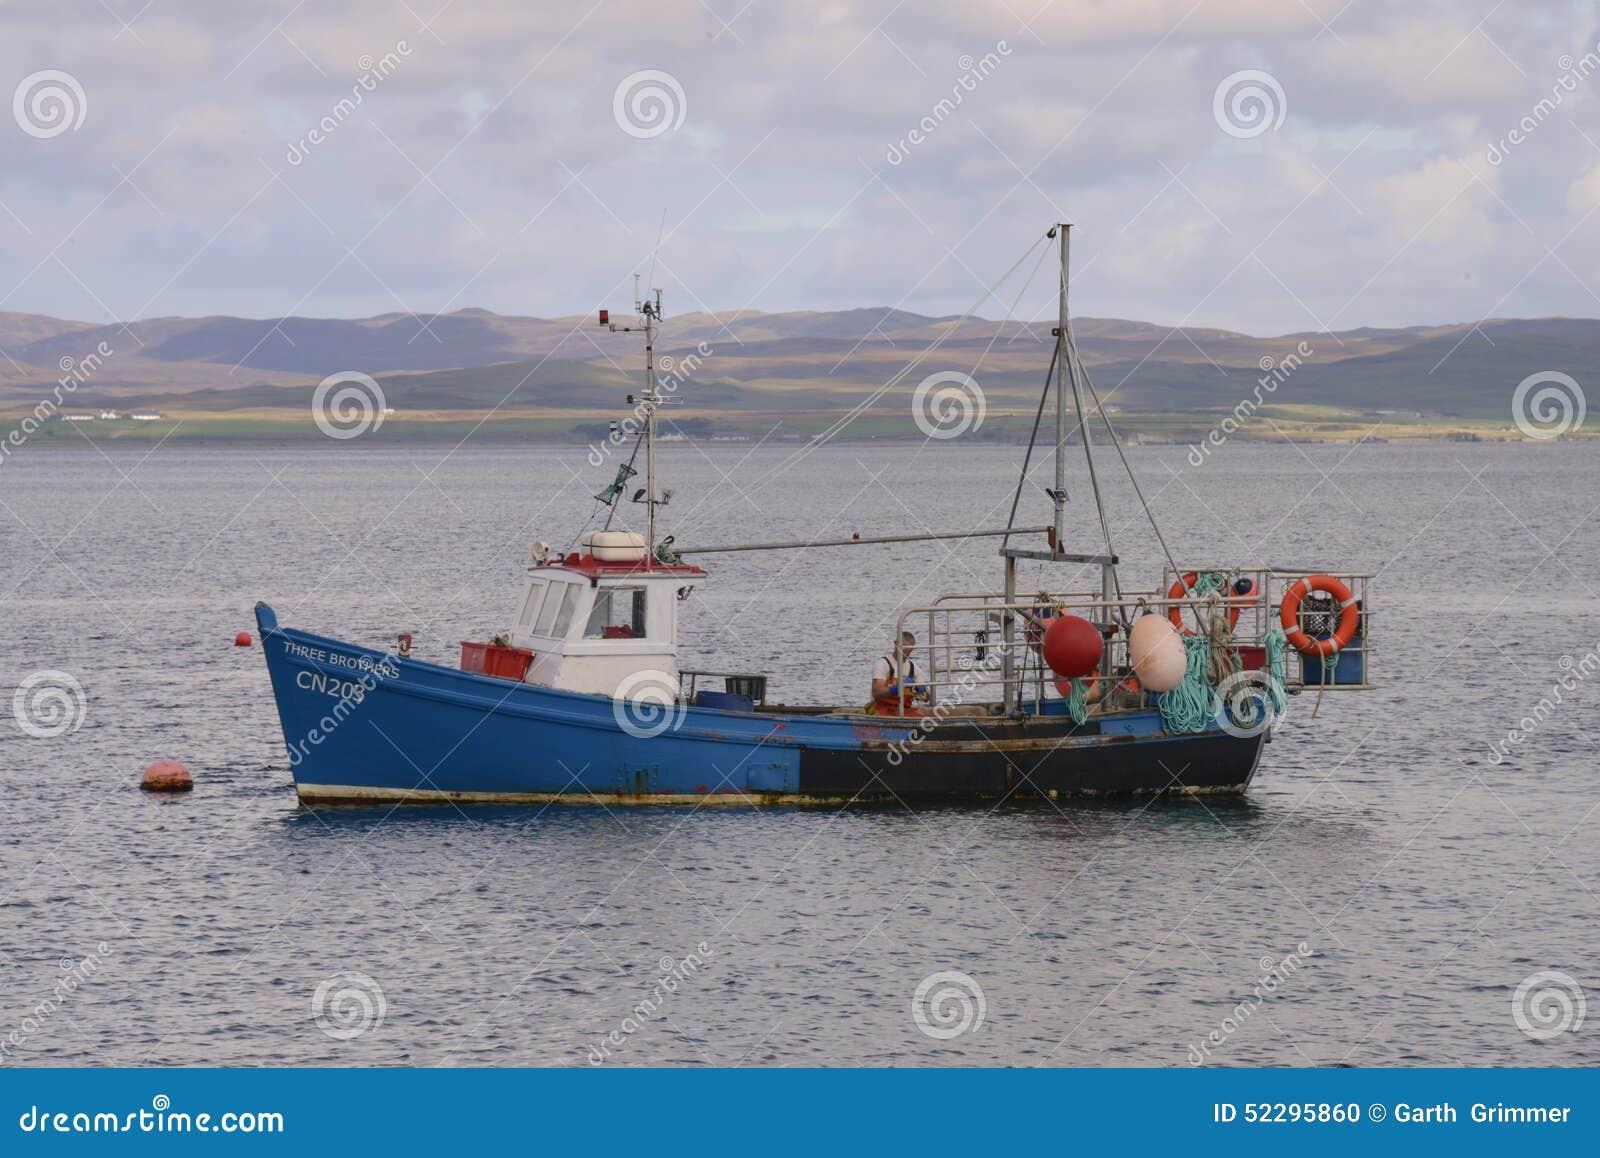 Get Scottish fishing boat plans | Patrick ribbon